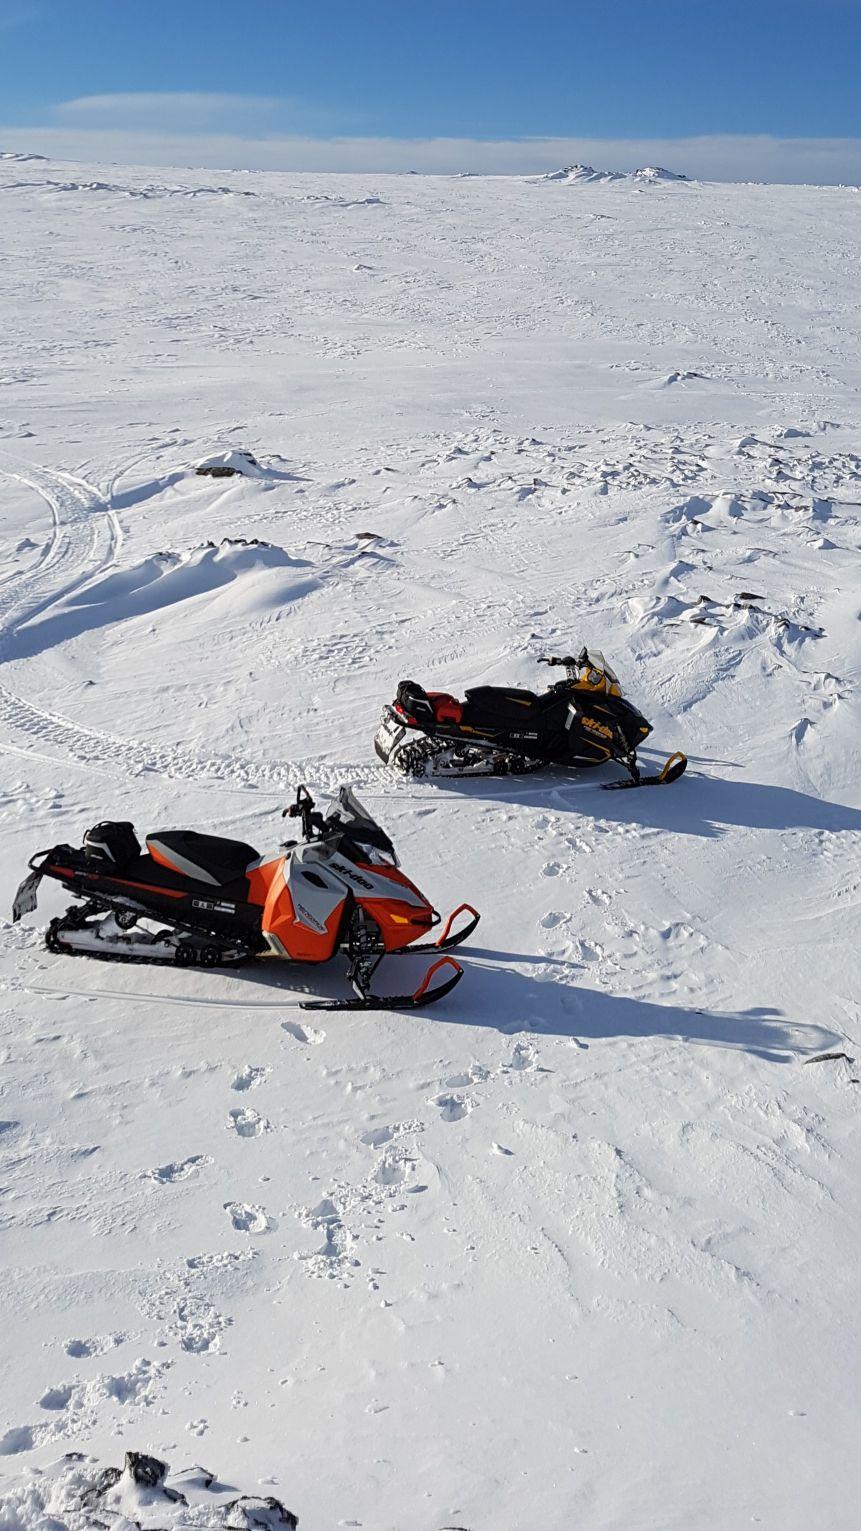 Skidoo Gps And Mount Photos Articles Ski Doo Wiring Diagram 2009 Summit 550f Western Newfoundland